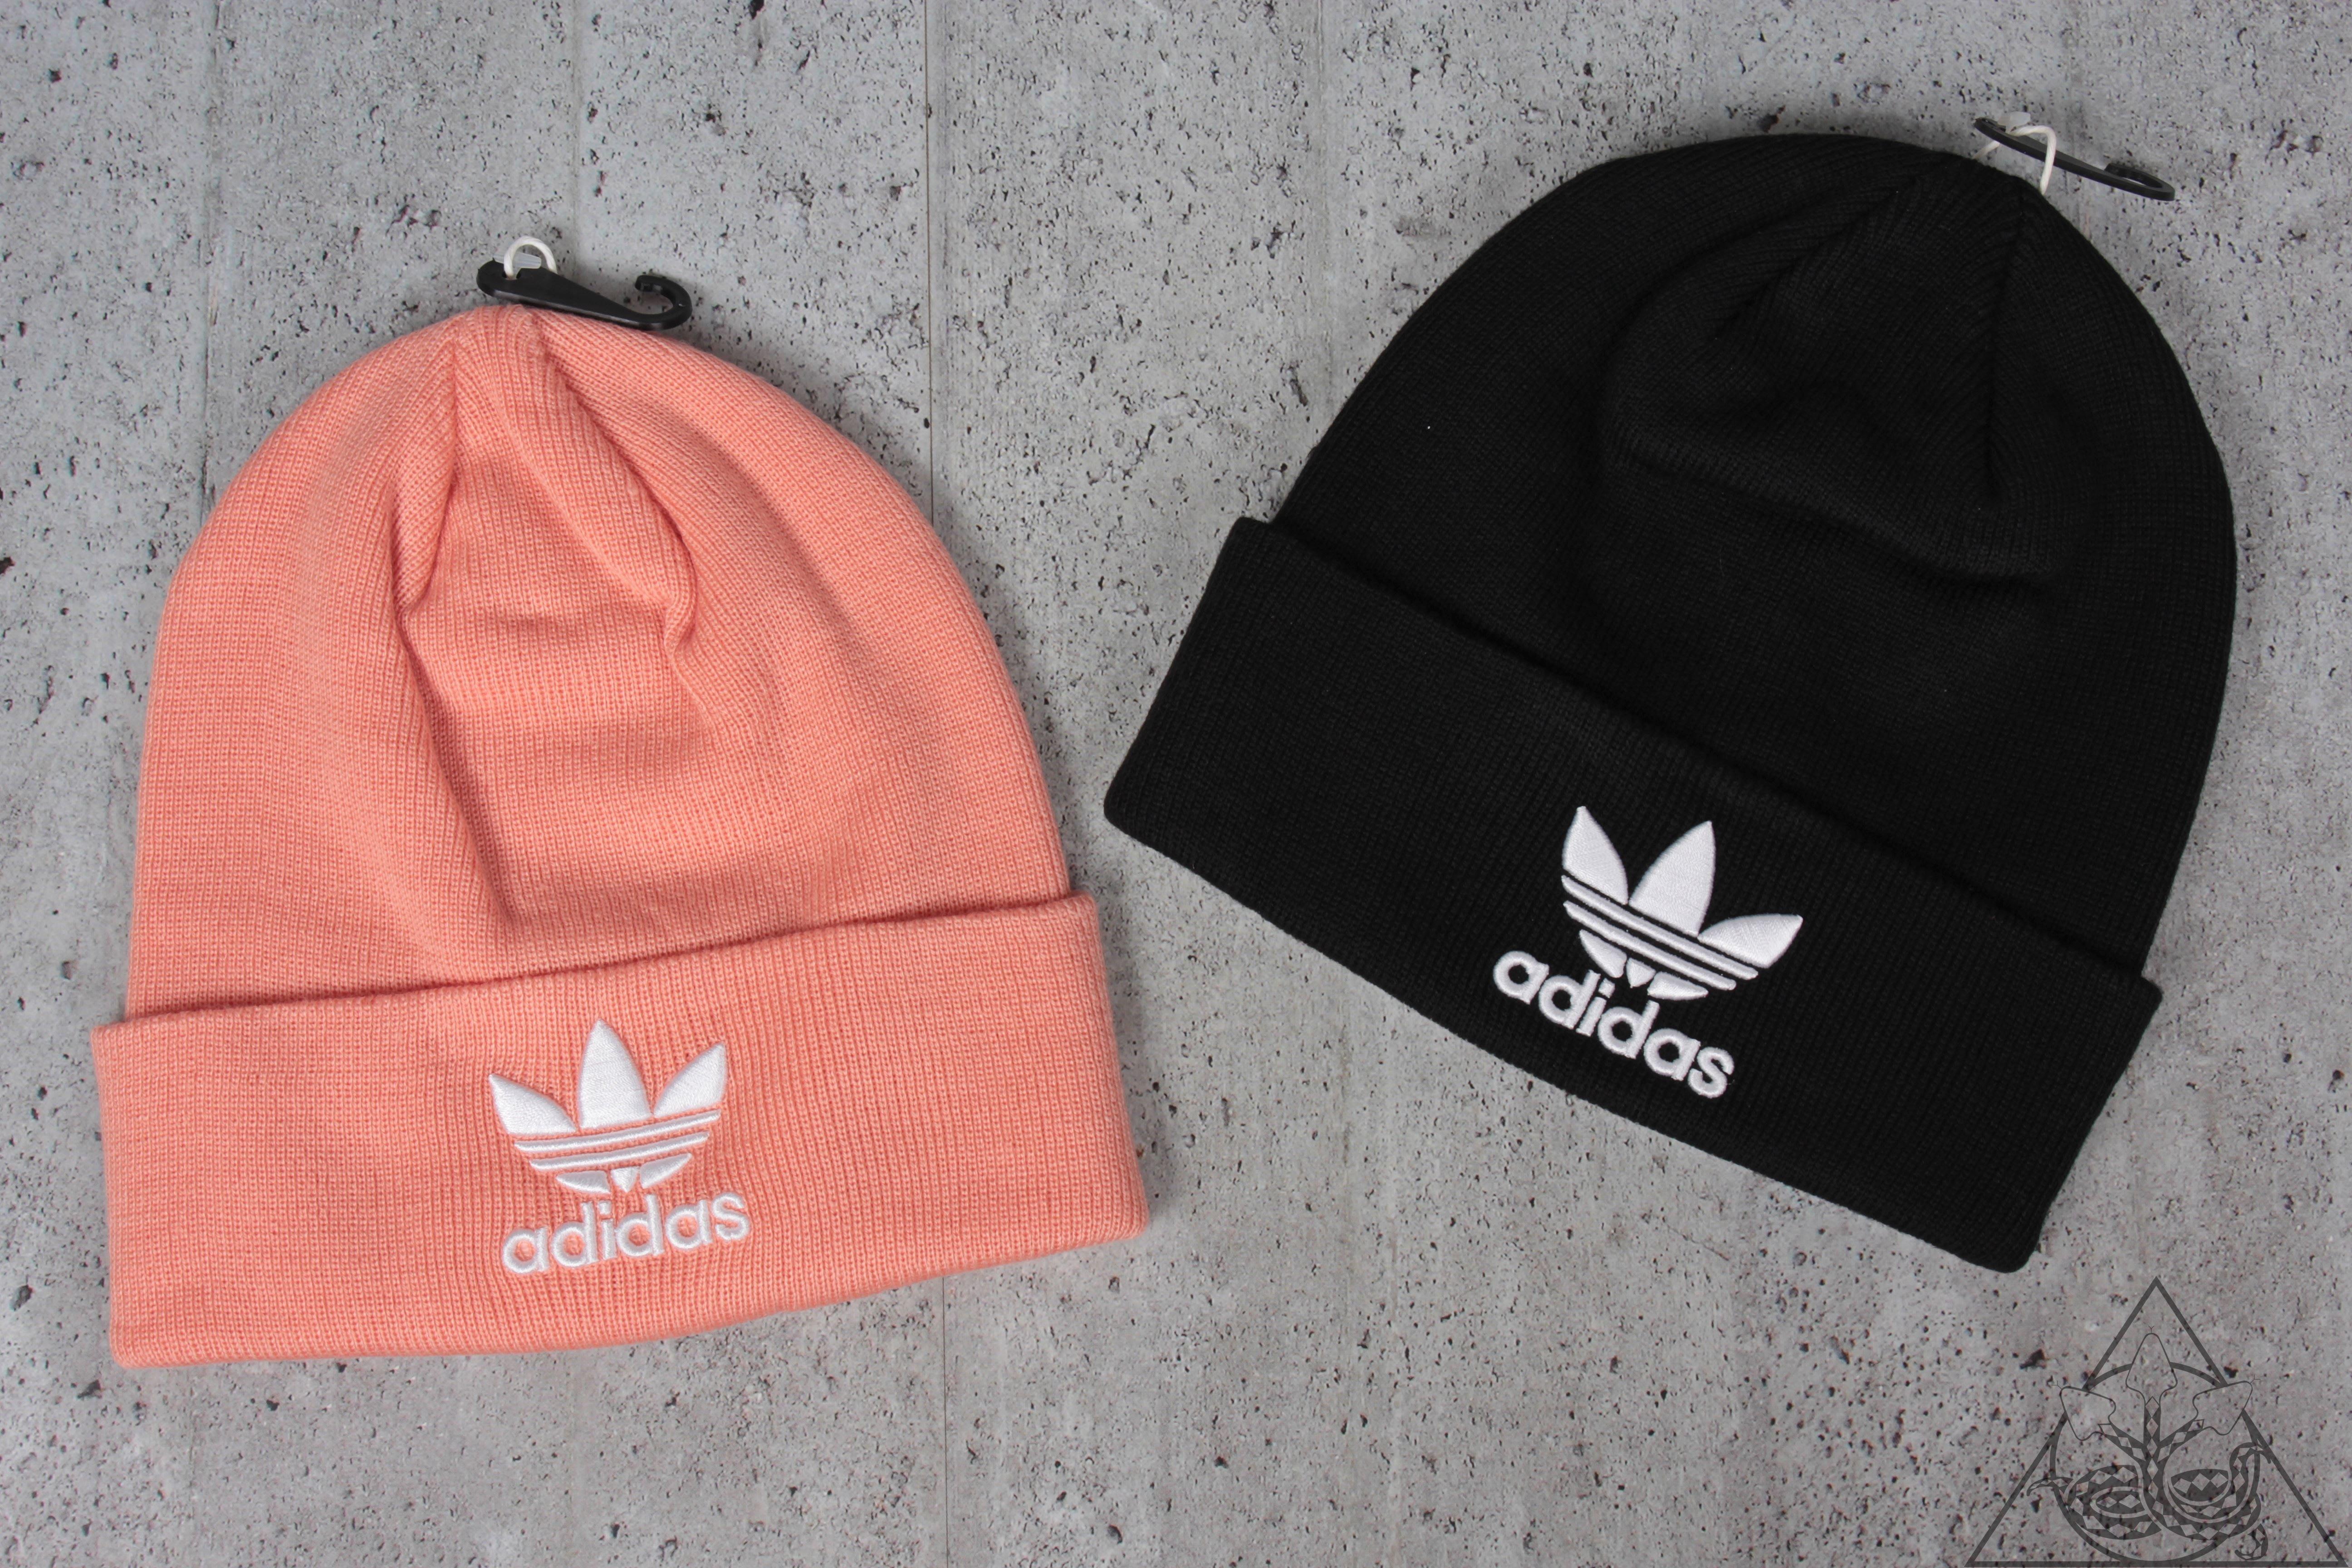 HYDRA Adidas Originals Trefoil Beanie 三葉草刺繡毛帽 BK7634  67bc10275ce1